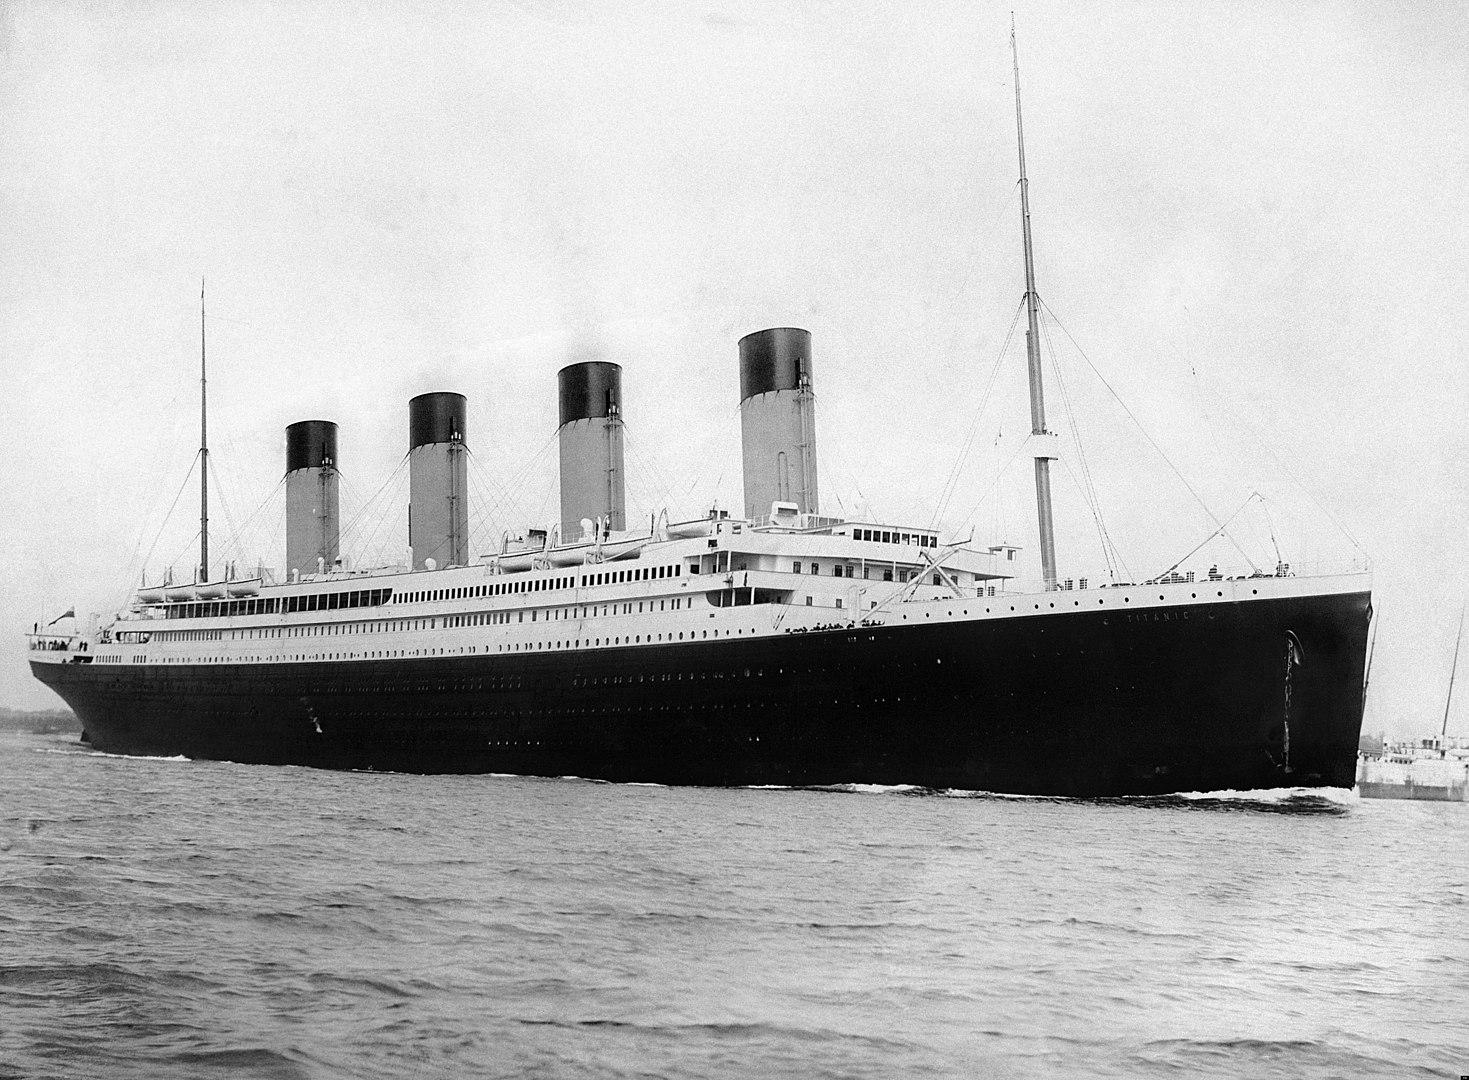 Titanic: The First Film to Hit the Billion-Dollar Mark